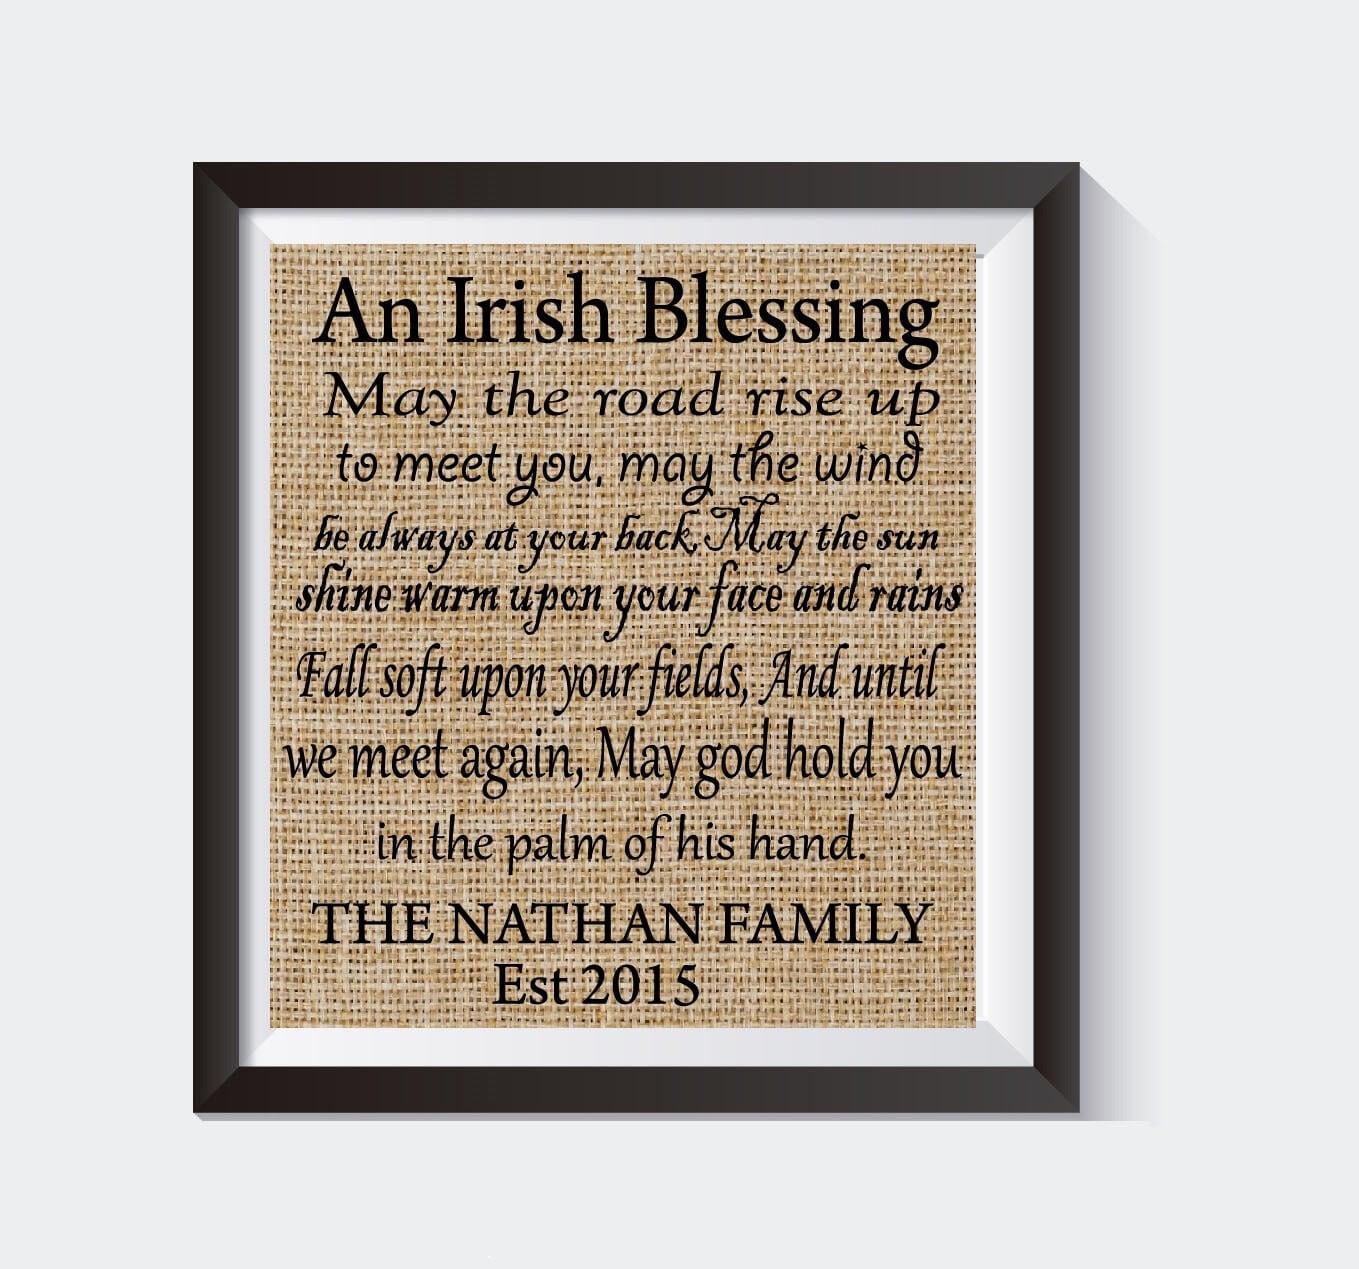 Personalized Irish Blessing House Warming Gift Burlap Print